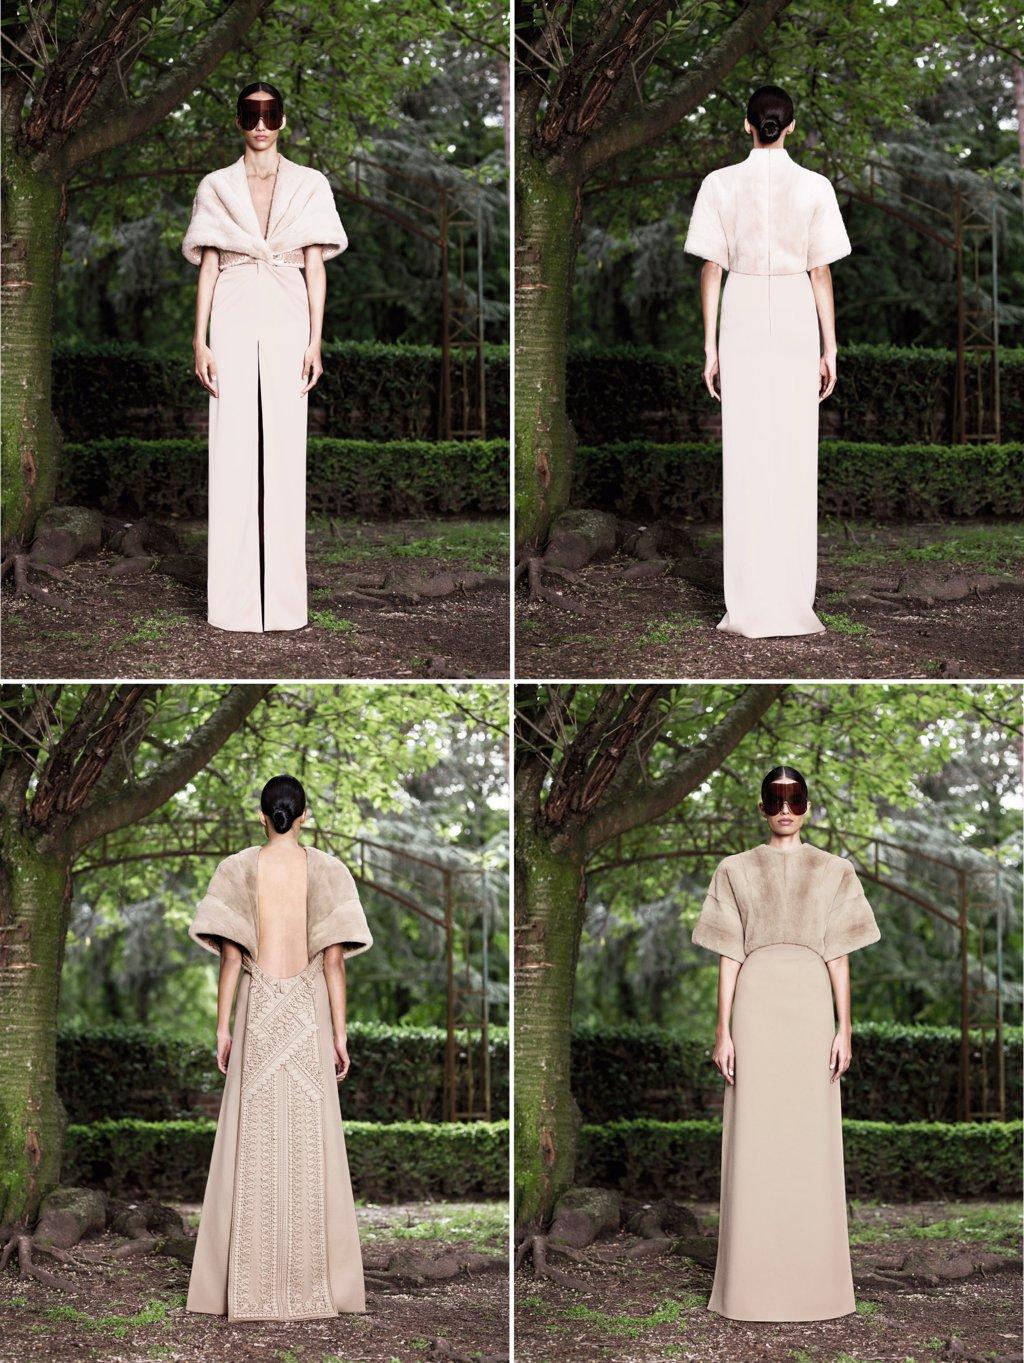 Runway-to-white-aisle-wedding-dress-inspiration-givenchy-beige-cream-wedding-dresses.full